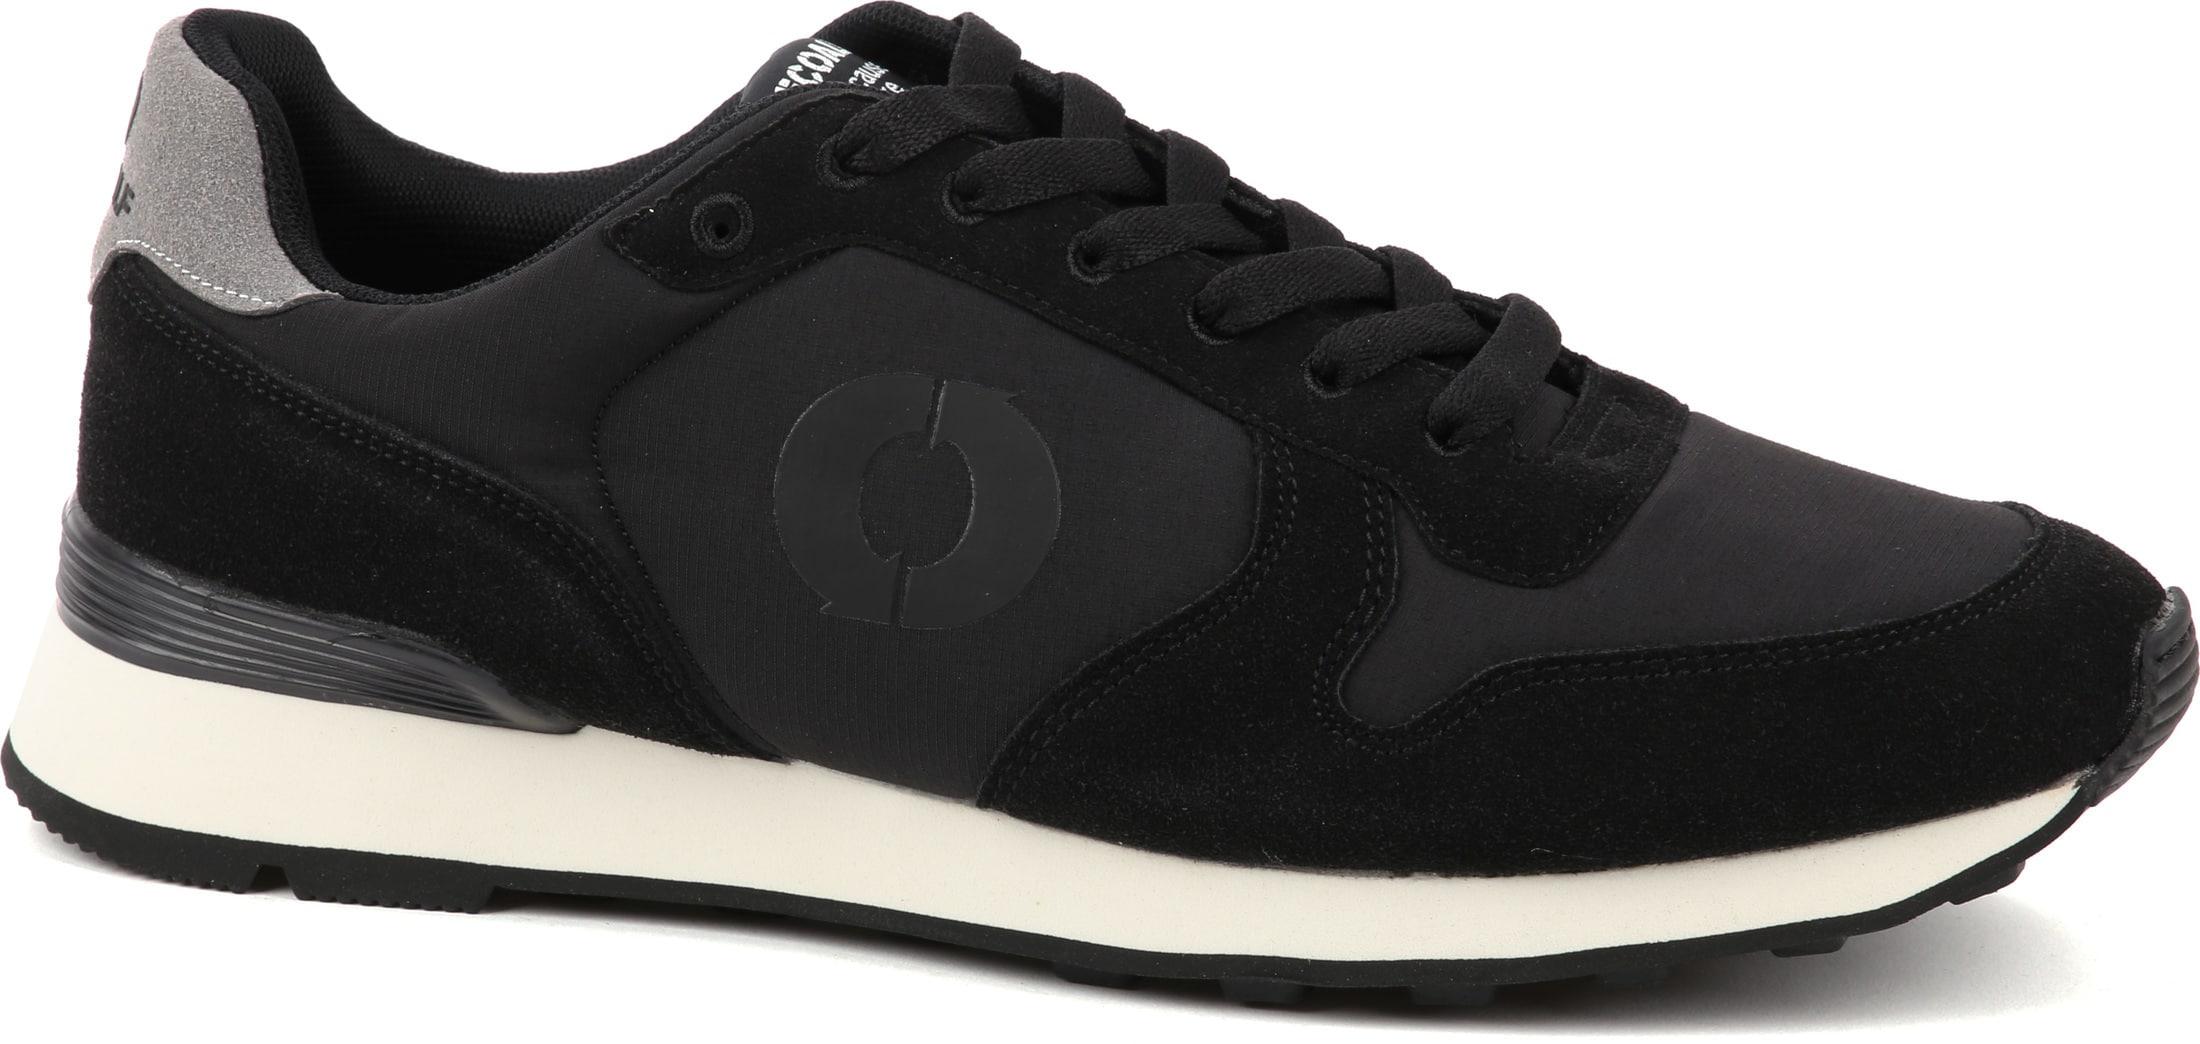 Ecoalf Sneaker Yale Black photo 0